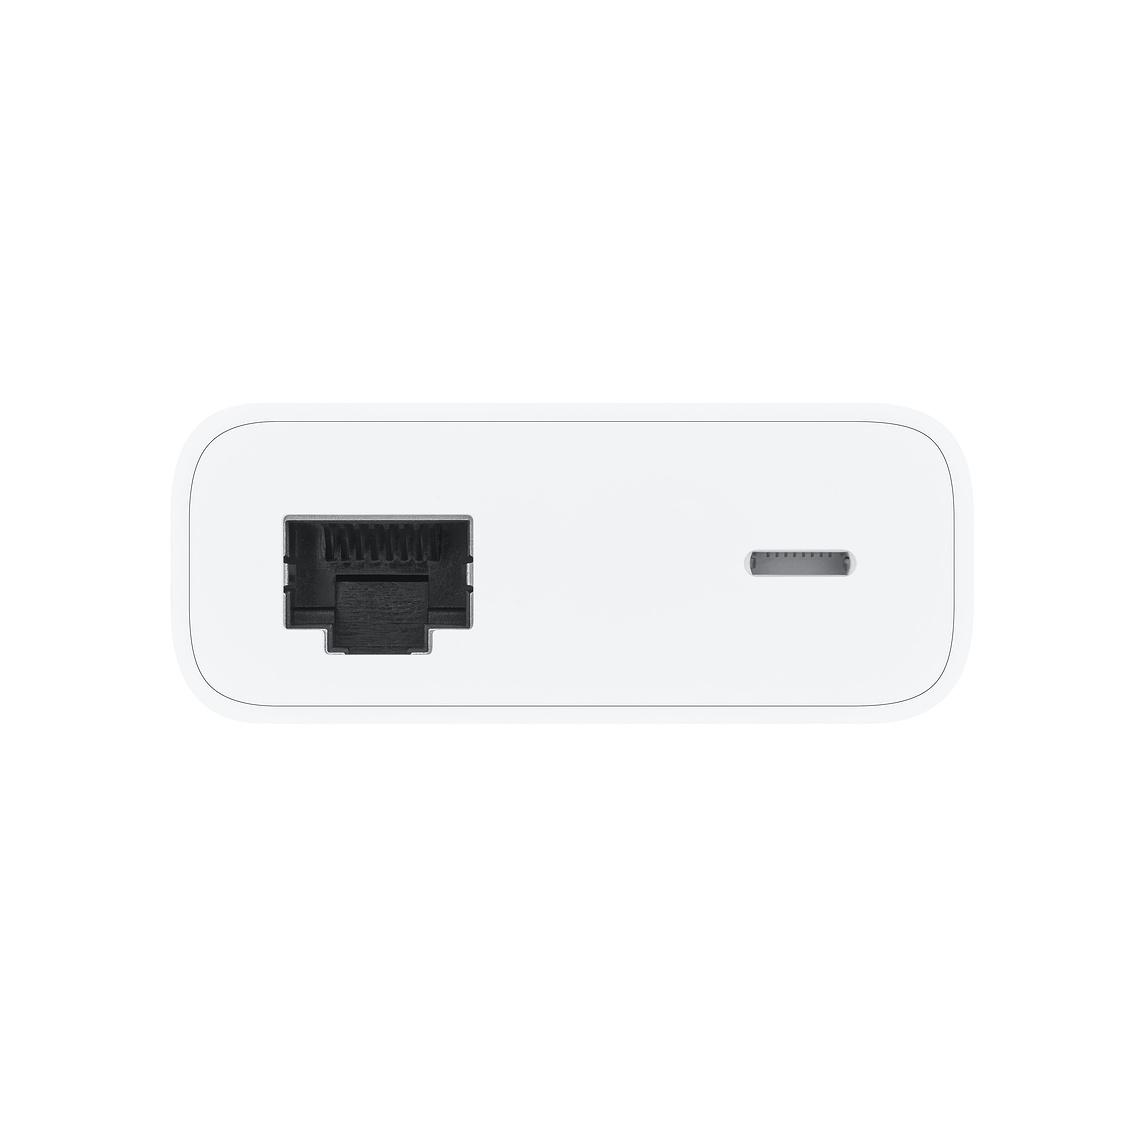 Cables Lightning a Ethernet y adaptadores de audio Lightning a USB-C agregados al programa MFi de Apple